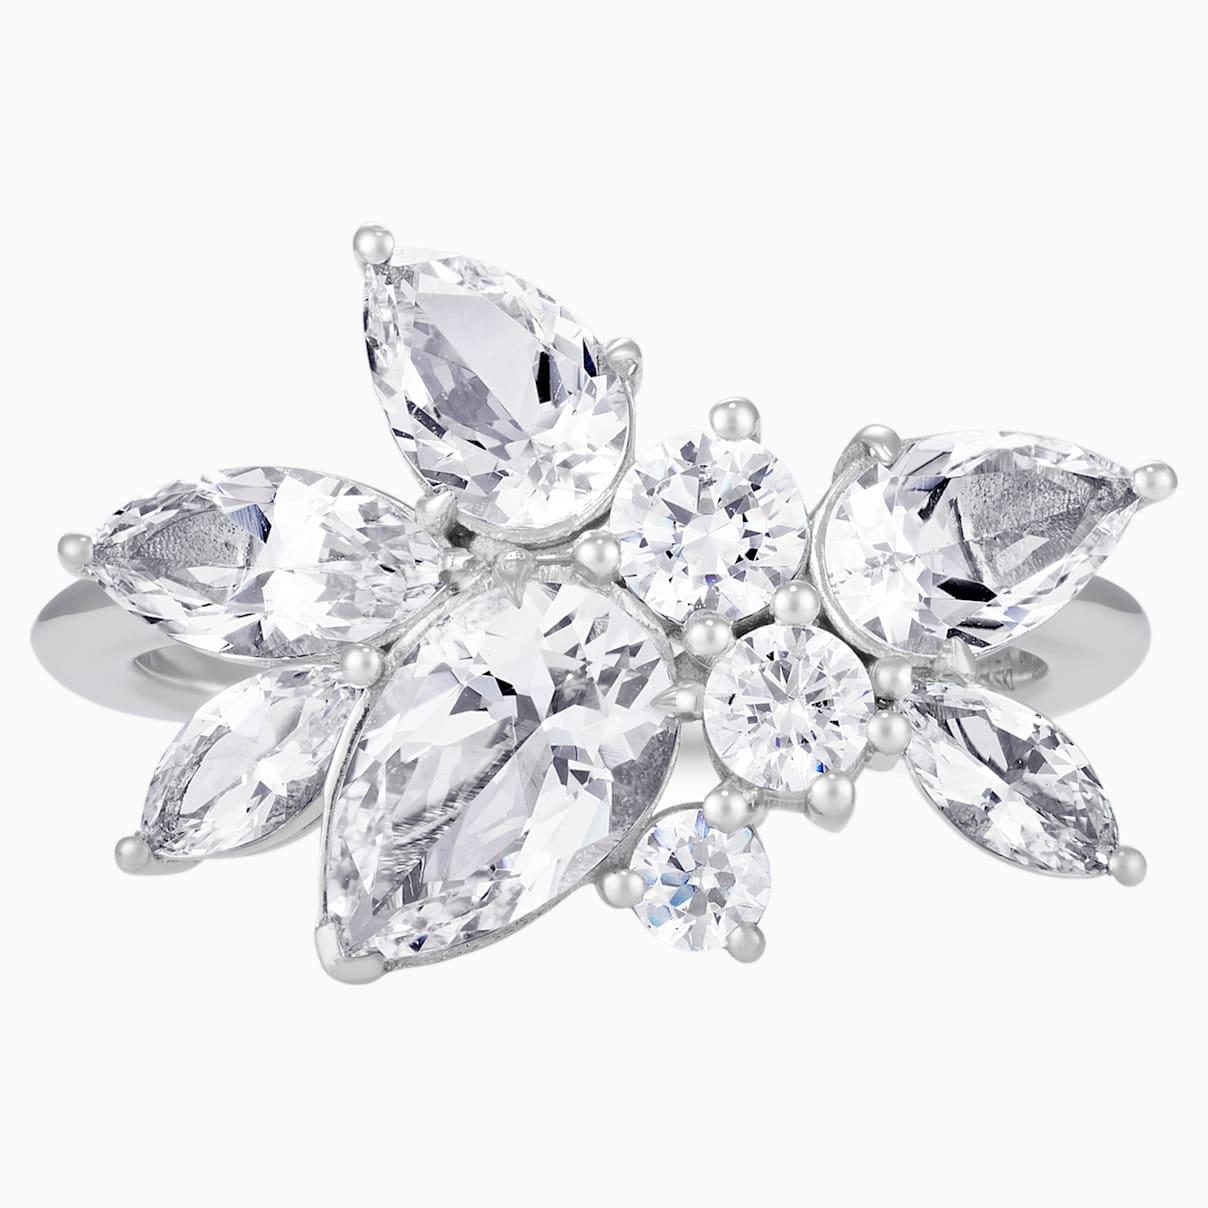 Luna Cluster Ring, Swarovski Created Diamonds, 18K White Gold, Size 58